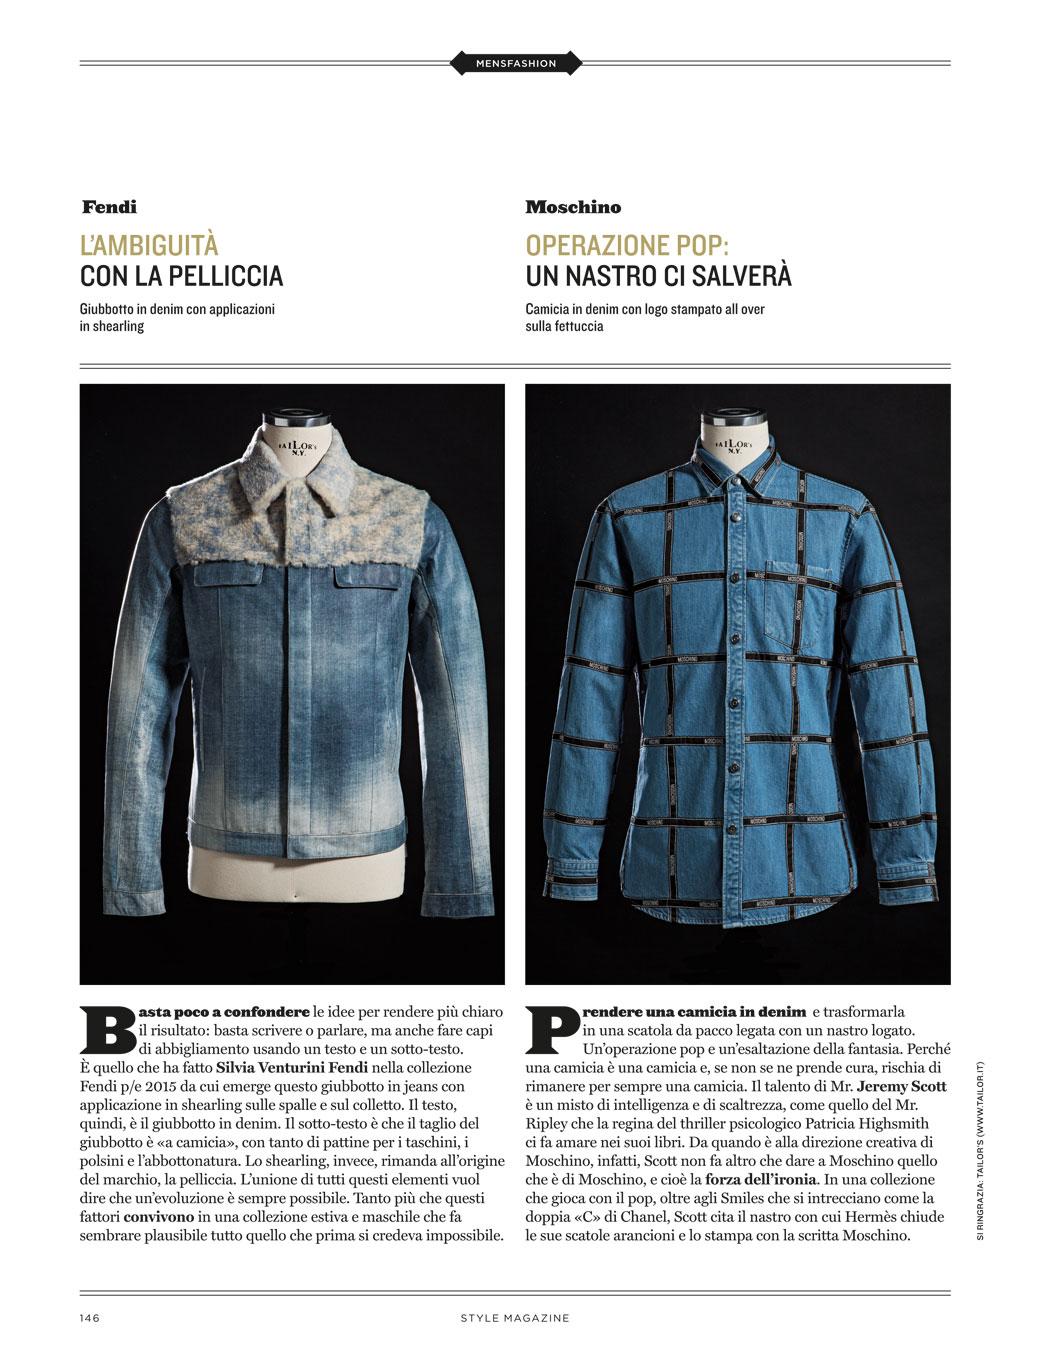 Style Magazine June 2015 Mensfashion Menswear The Men Issue